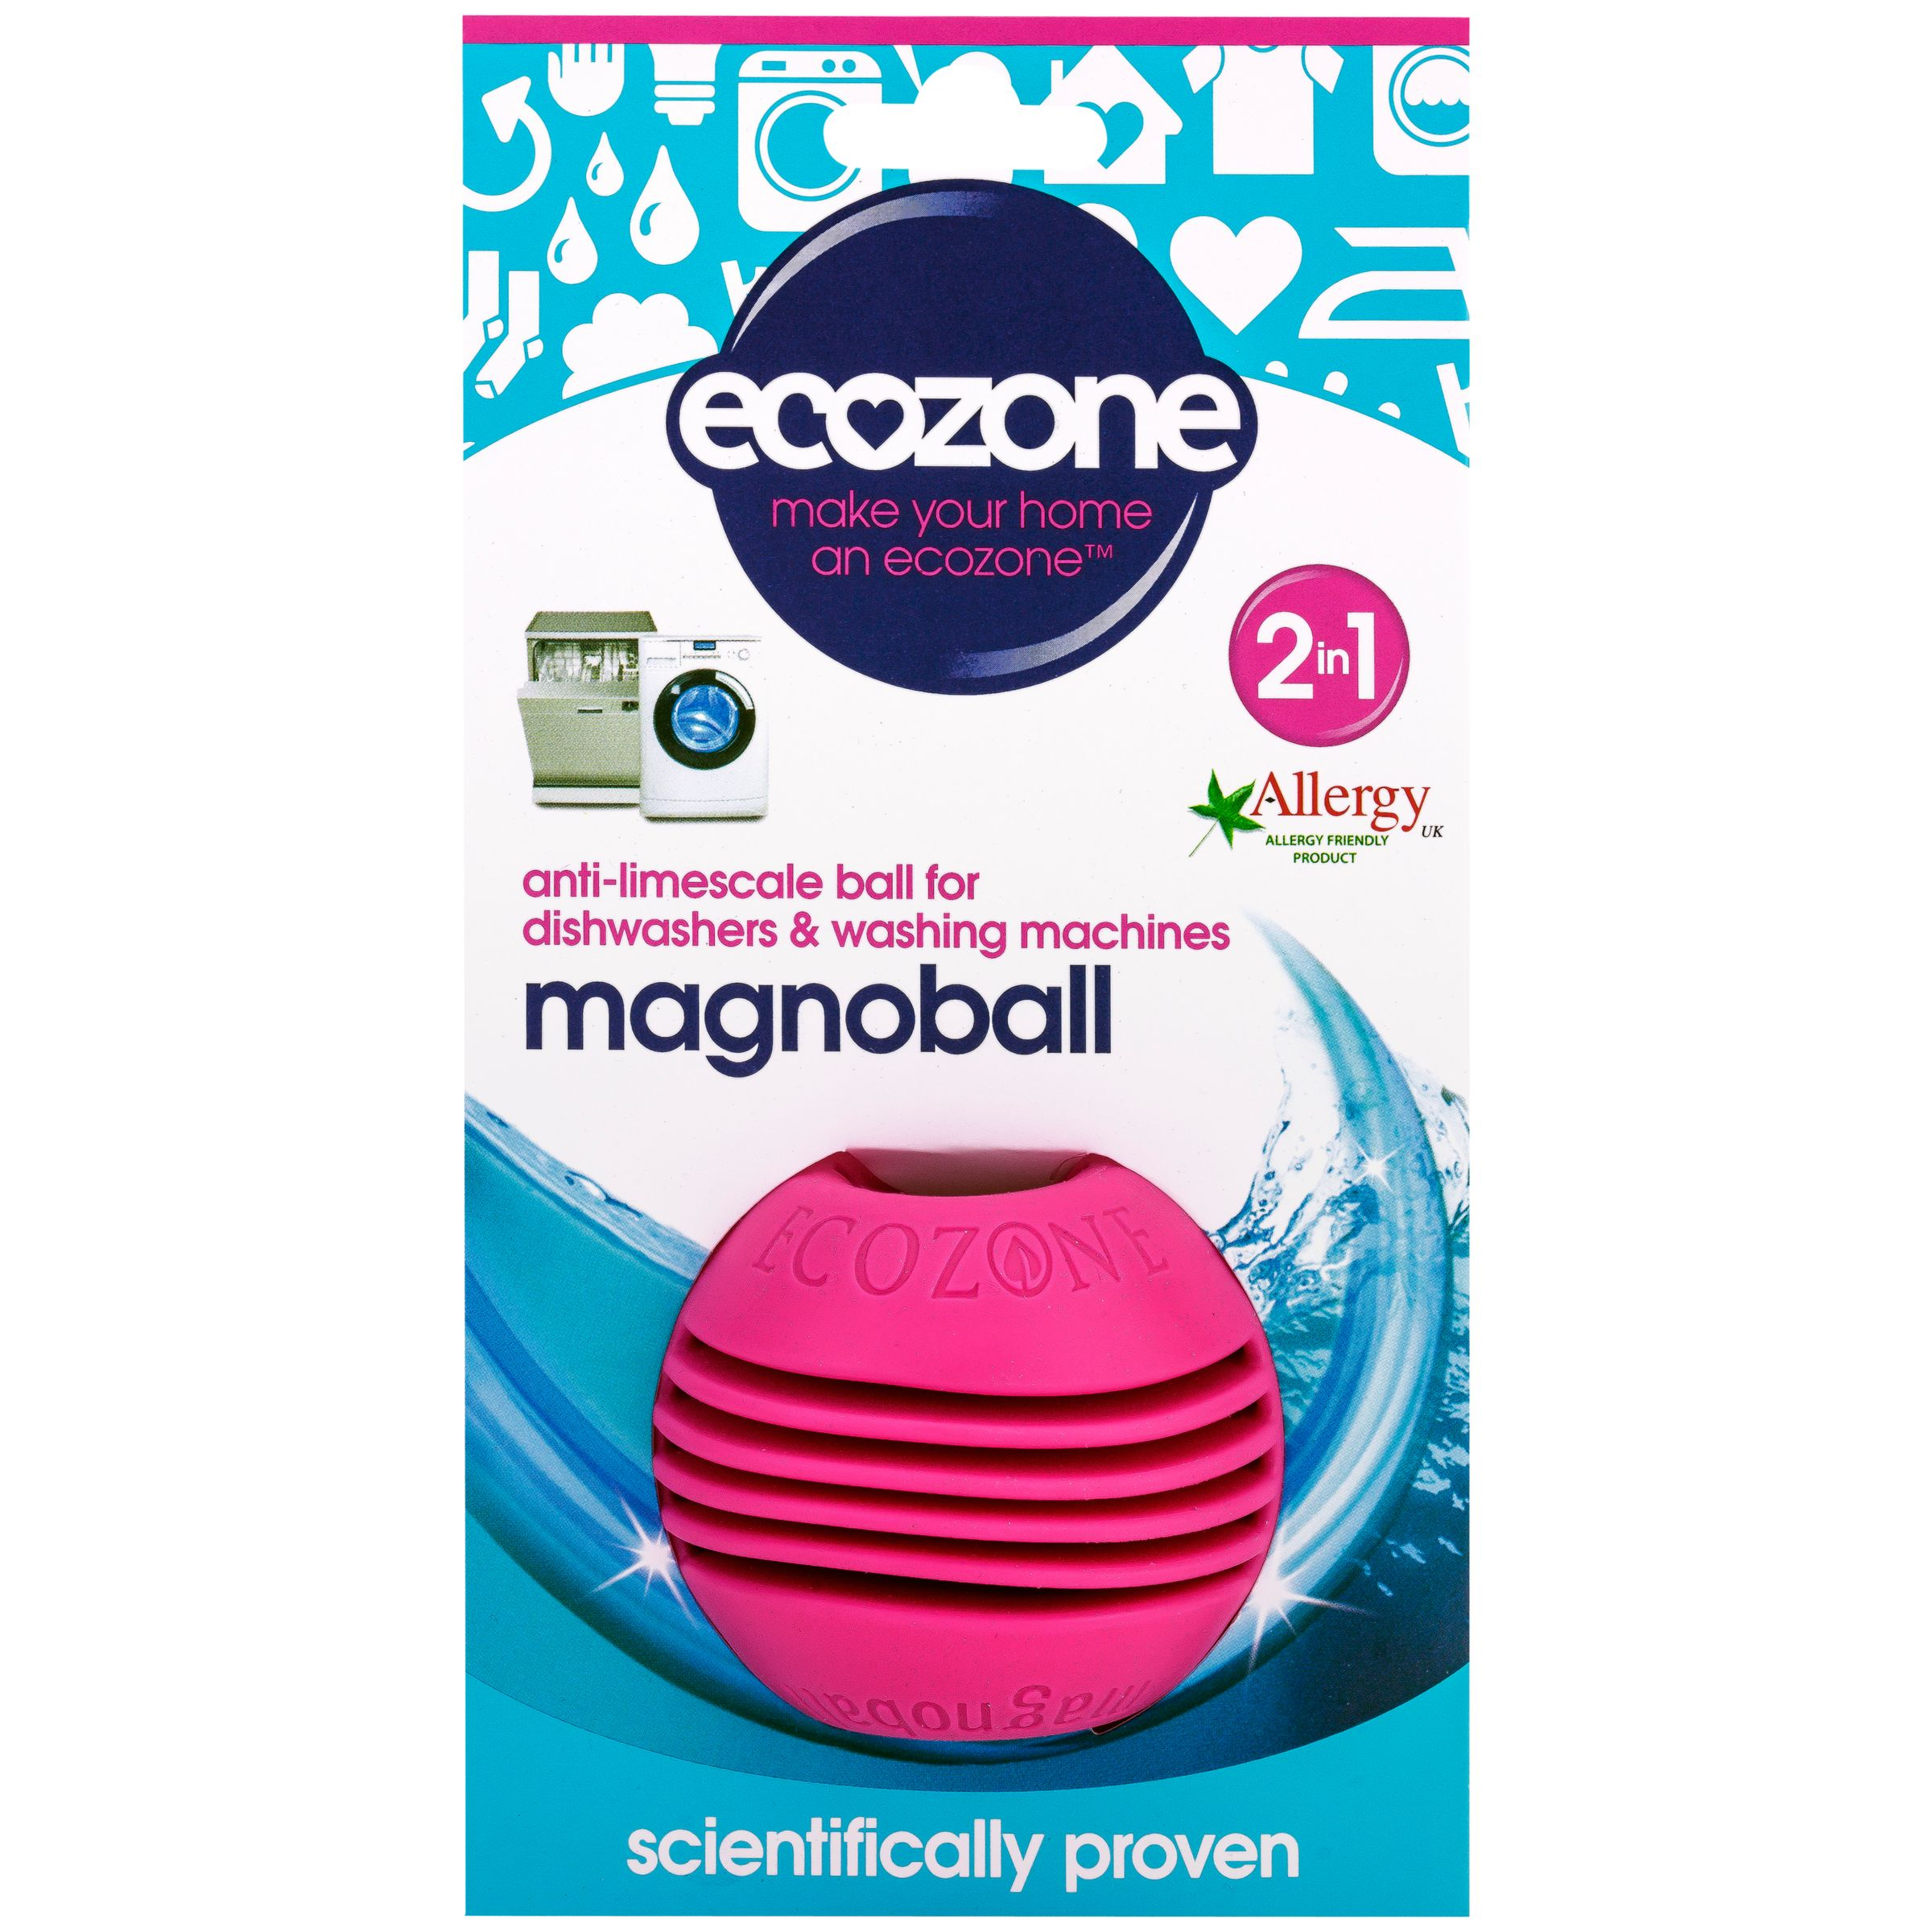 Ecozone Ecozone Washing Machine and Dishwasher Anti-Limescale Ball